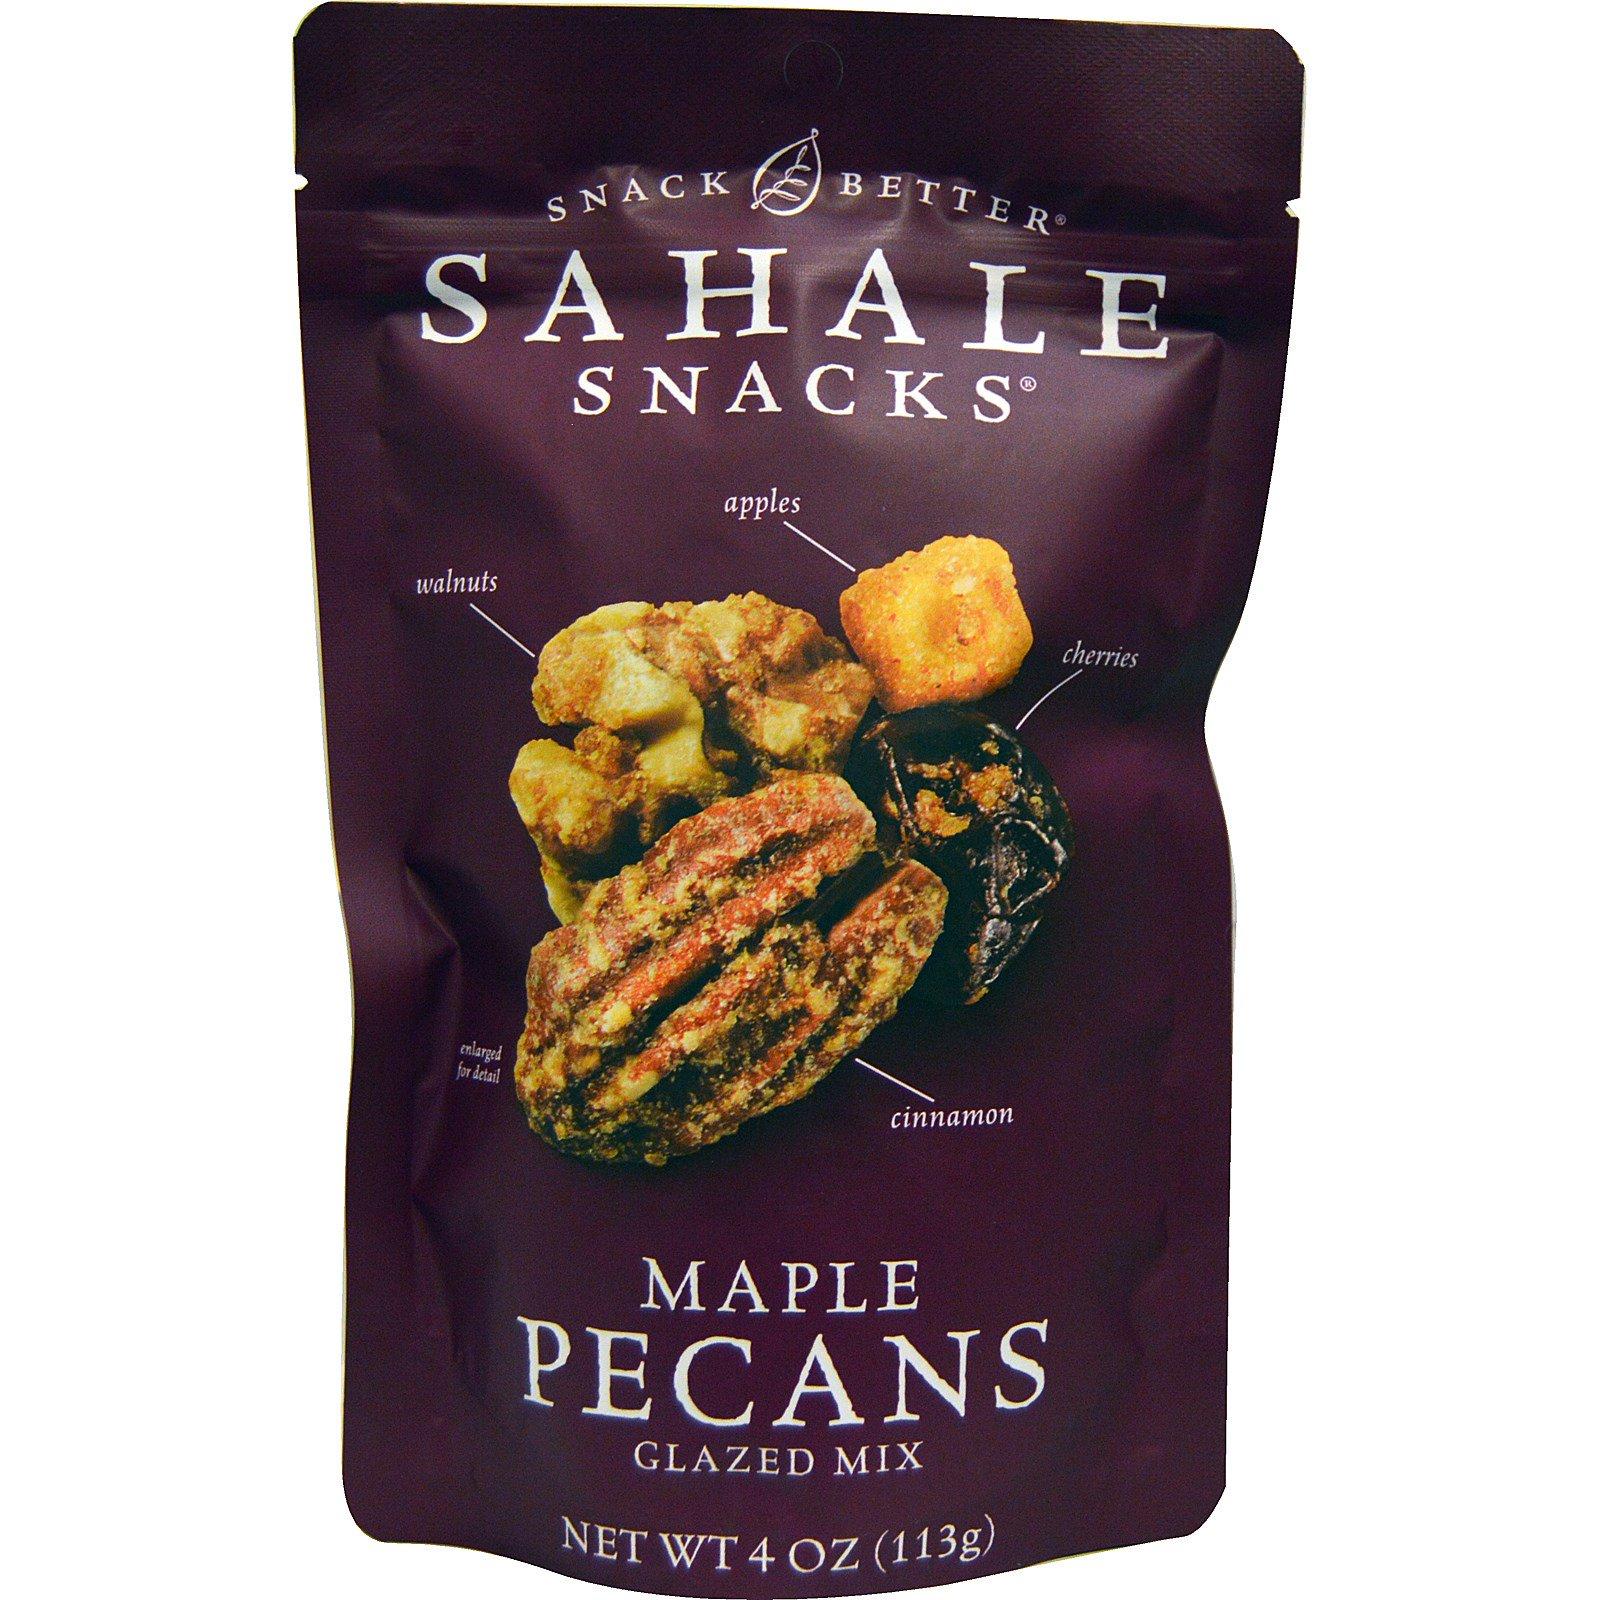 Sahalee snacks